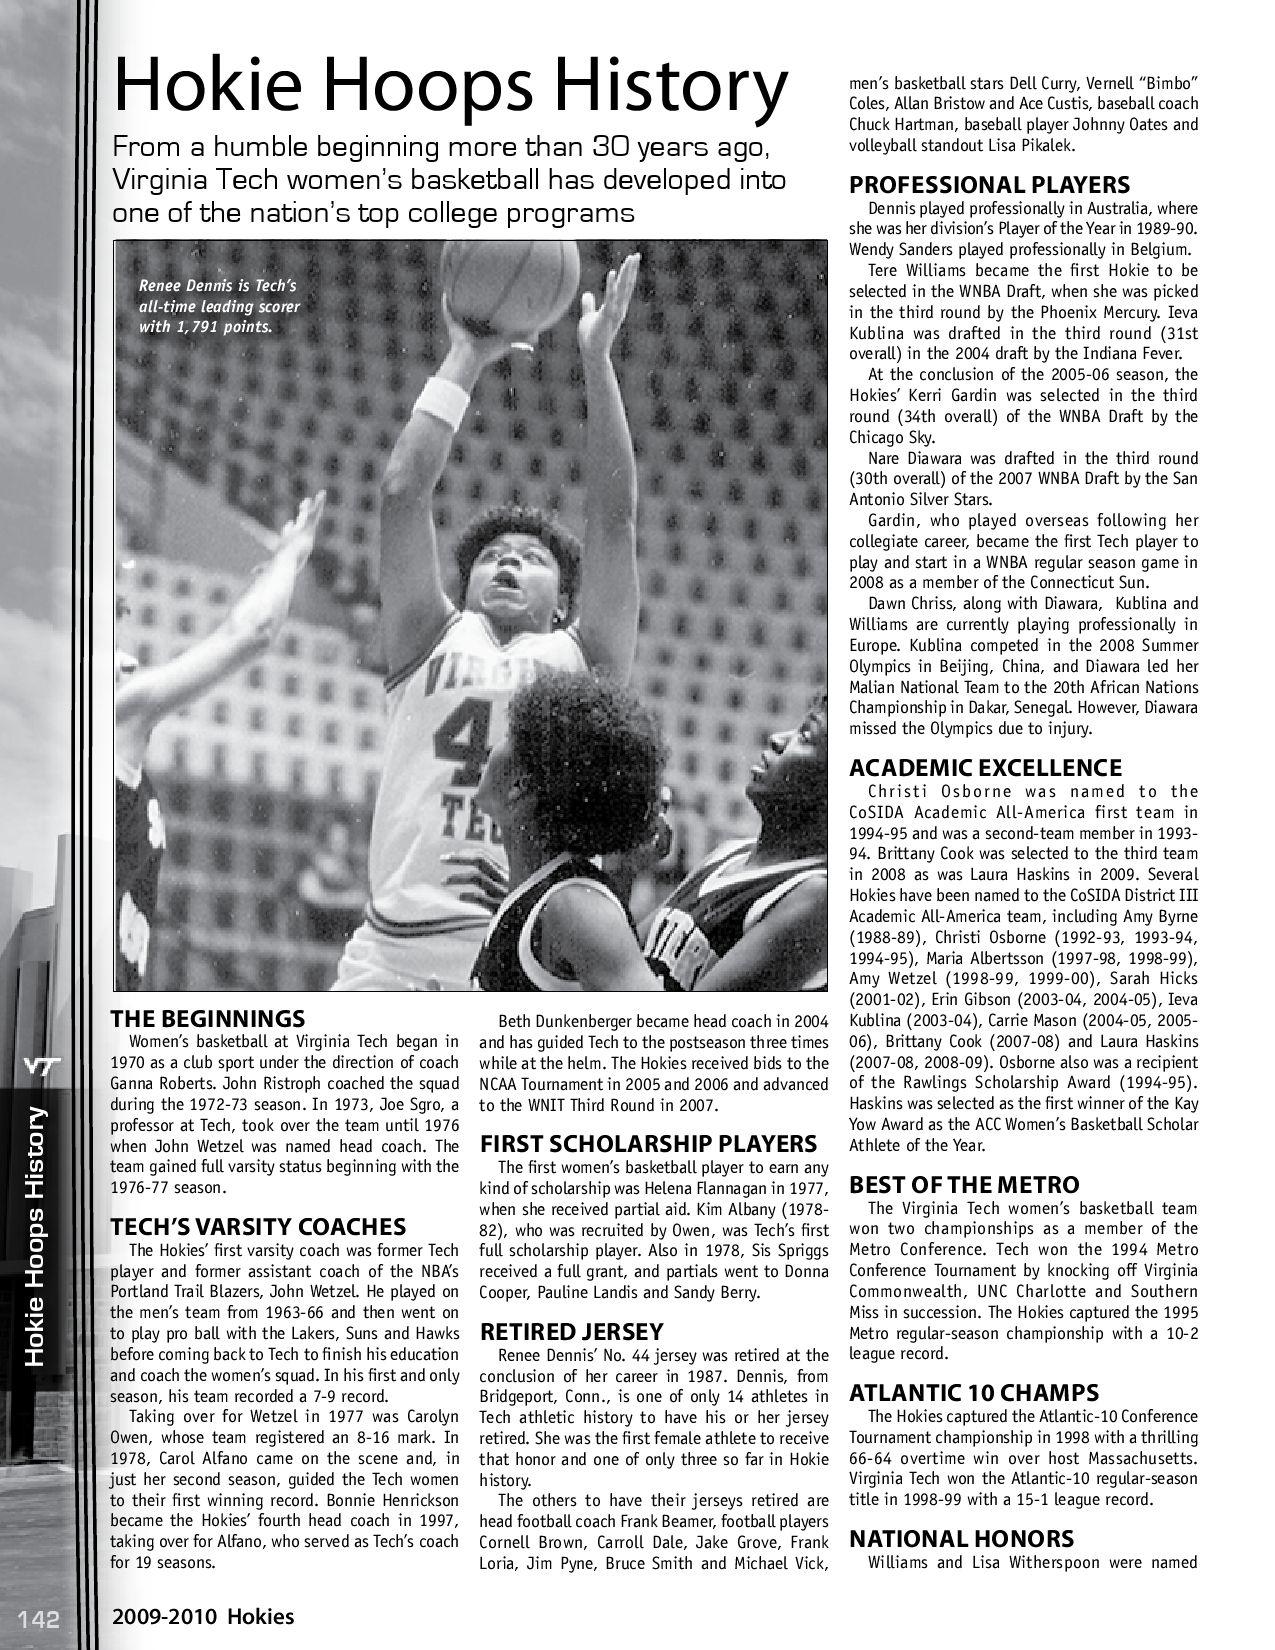 2009-10 Virginia Tech Women's Basketball Media Guide by